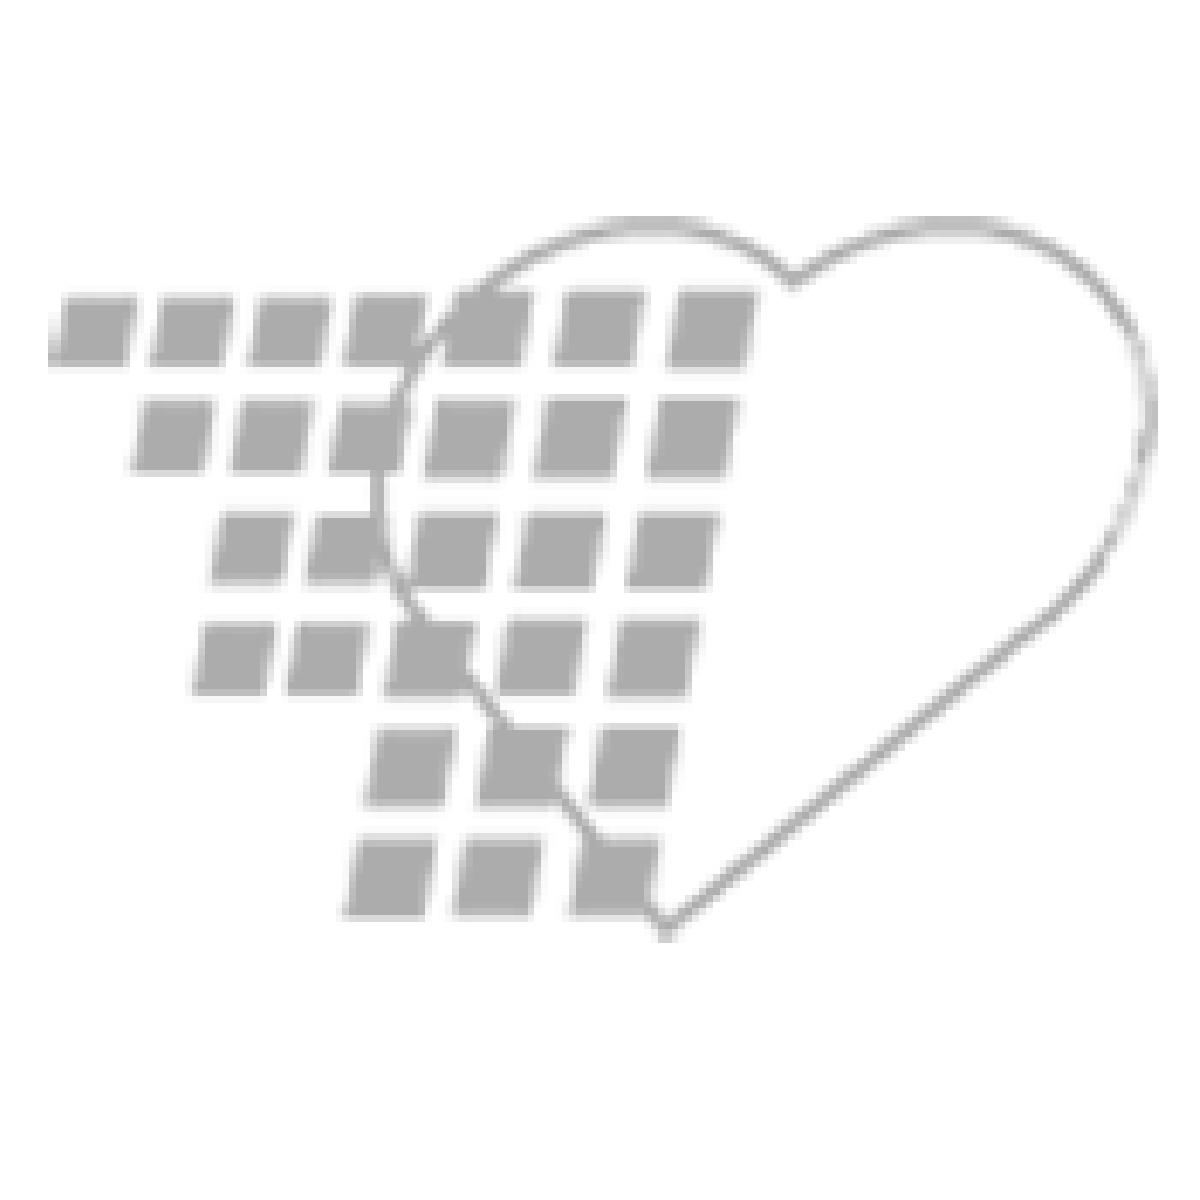 03-47-1032 Innovative Healthcare Latex Exam Gloves Singles, Sterile